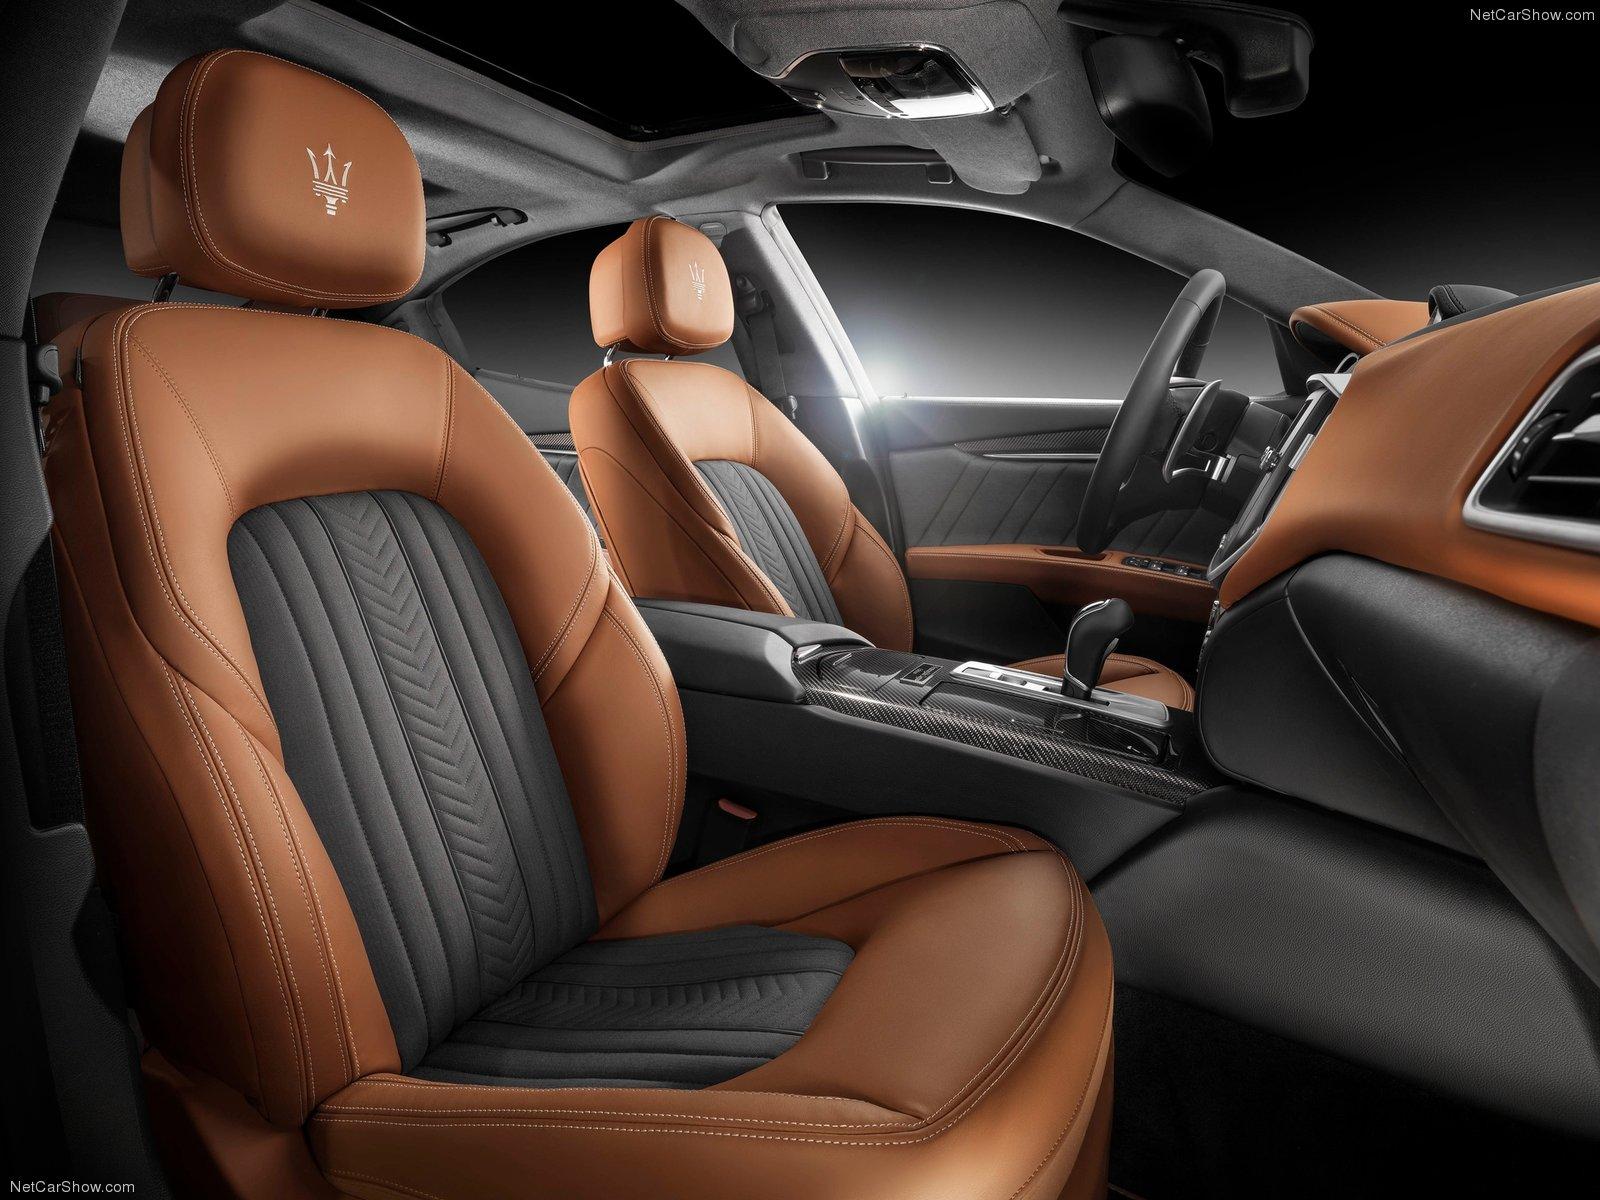 Hình ảnh siêu xe Maserati Ghibli Ermenegildo Zegna Edition Concept 2014 & nội ngoại thất